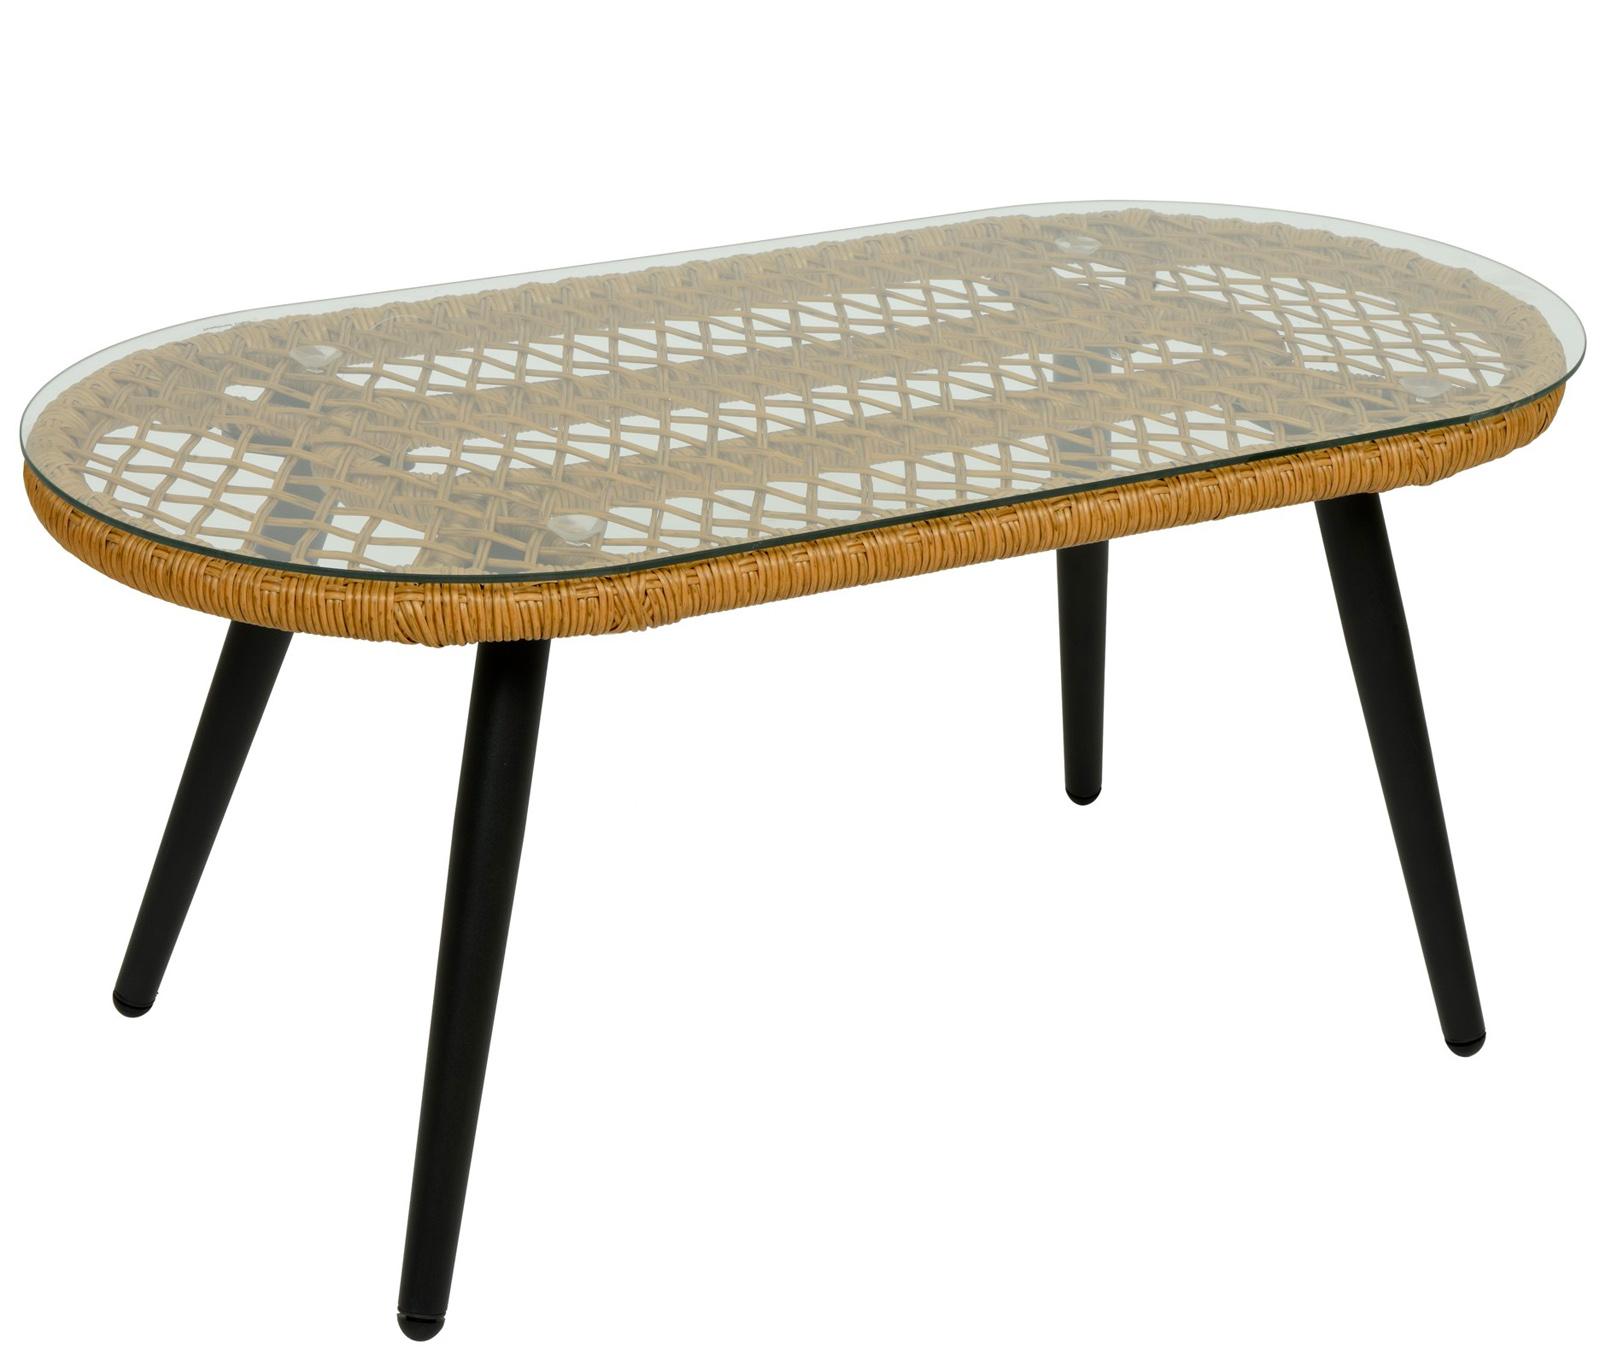 table basse de jardin resine tressee finition naturelle kampala